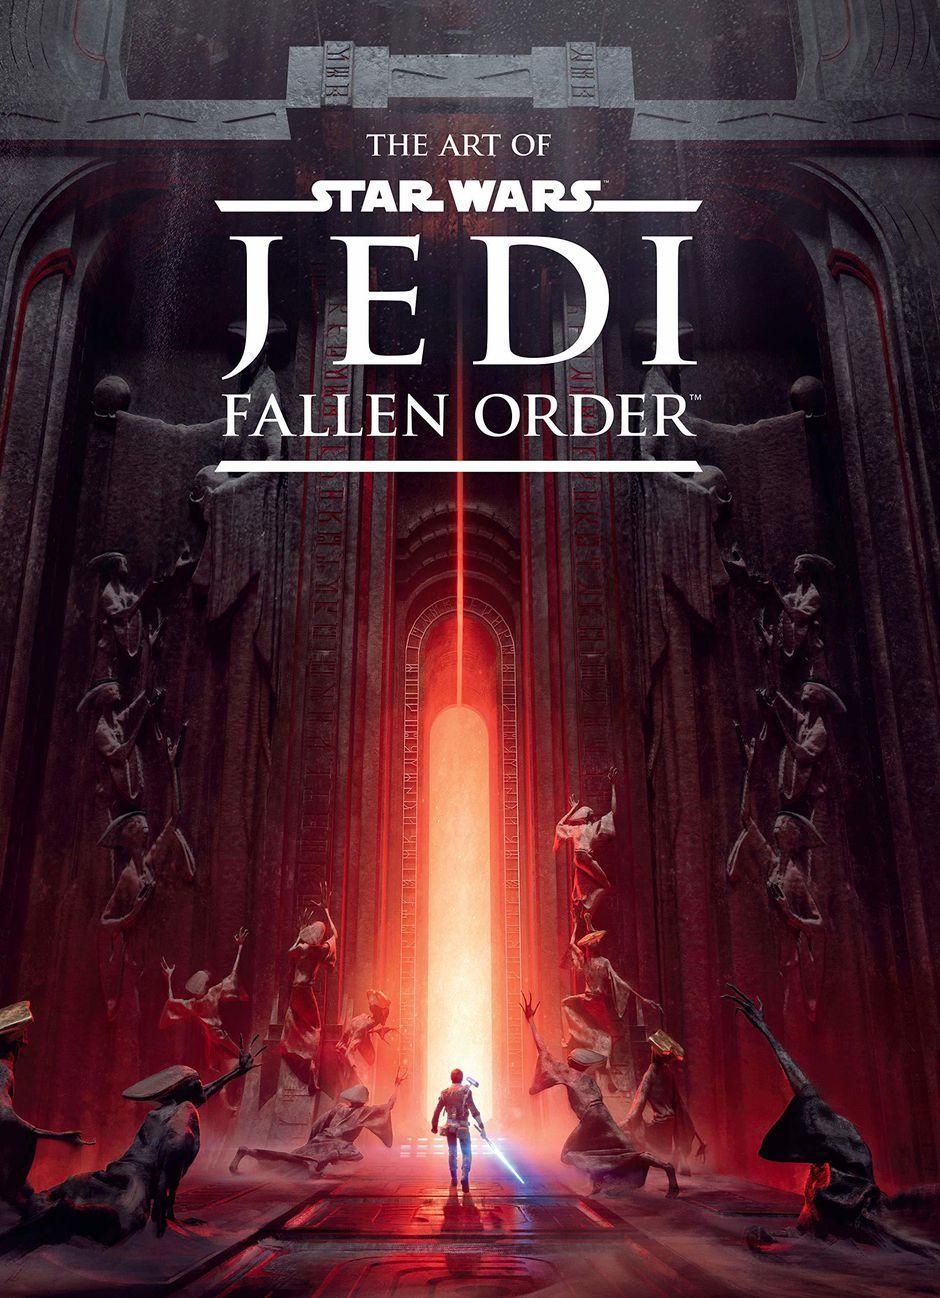 Jedi Fallen Order HD Phone Wallpapers - Wallpaper Cave